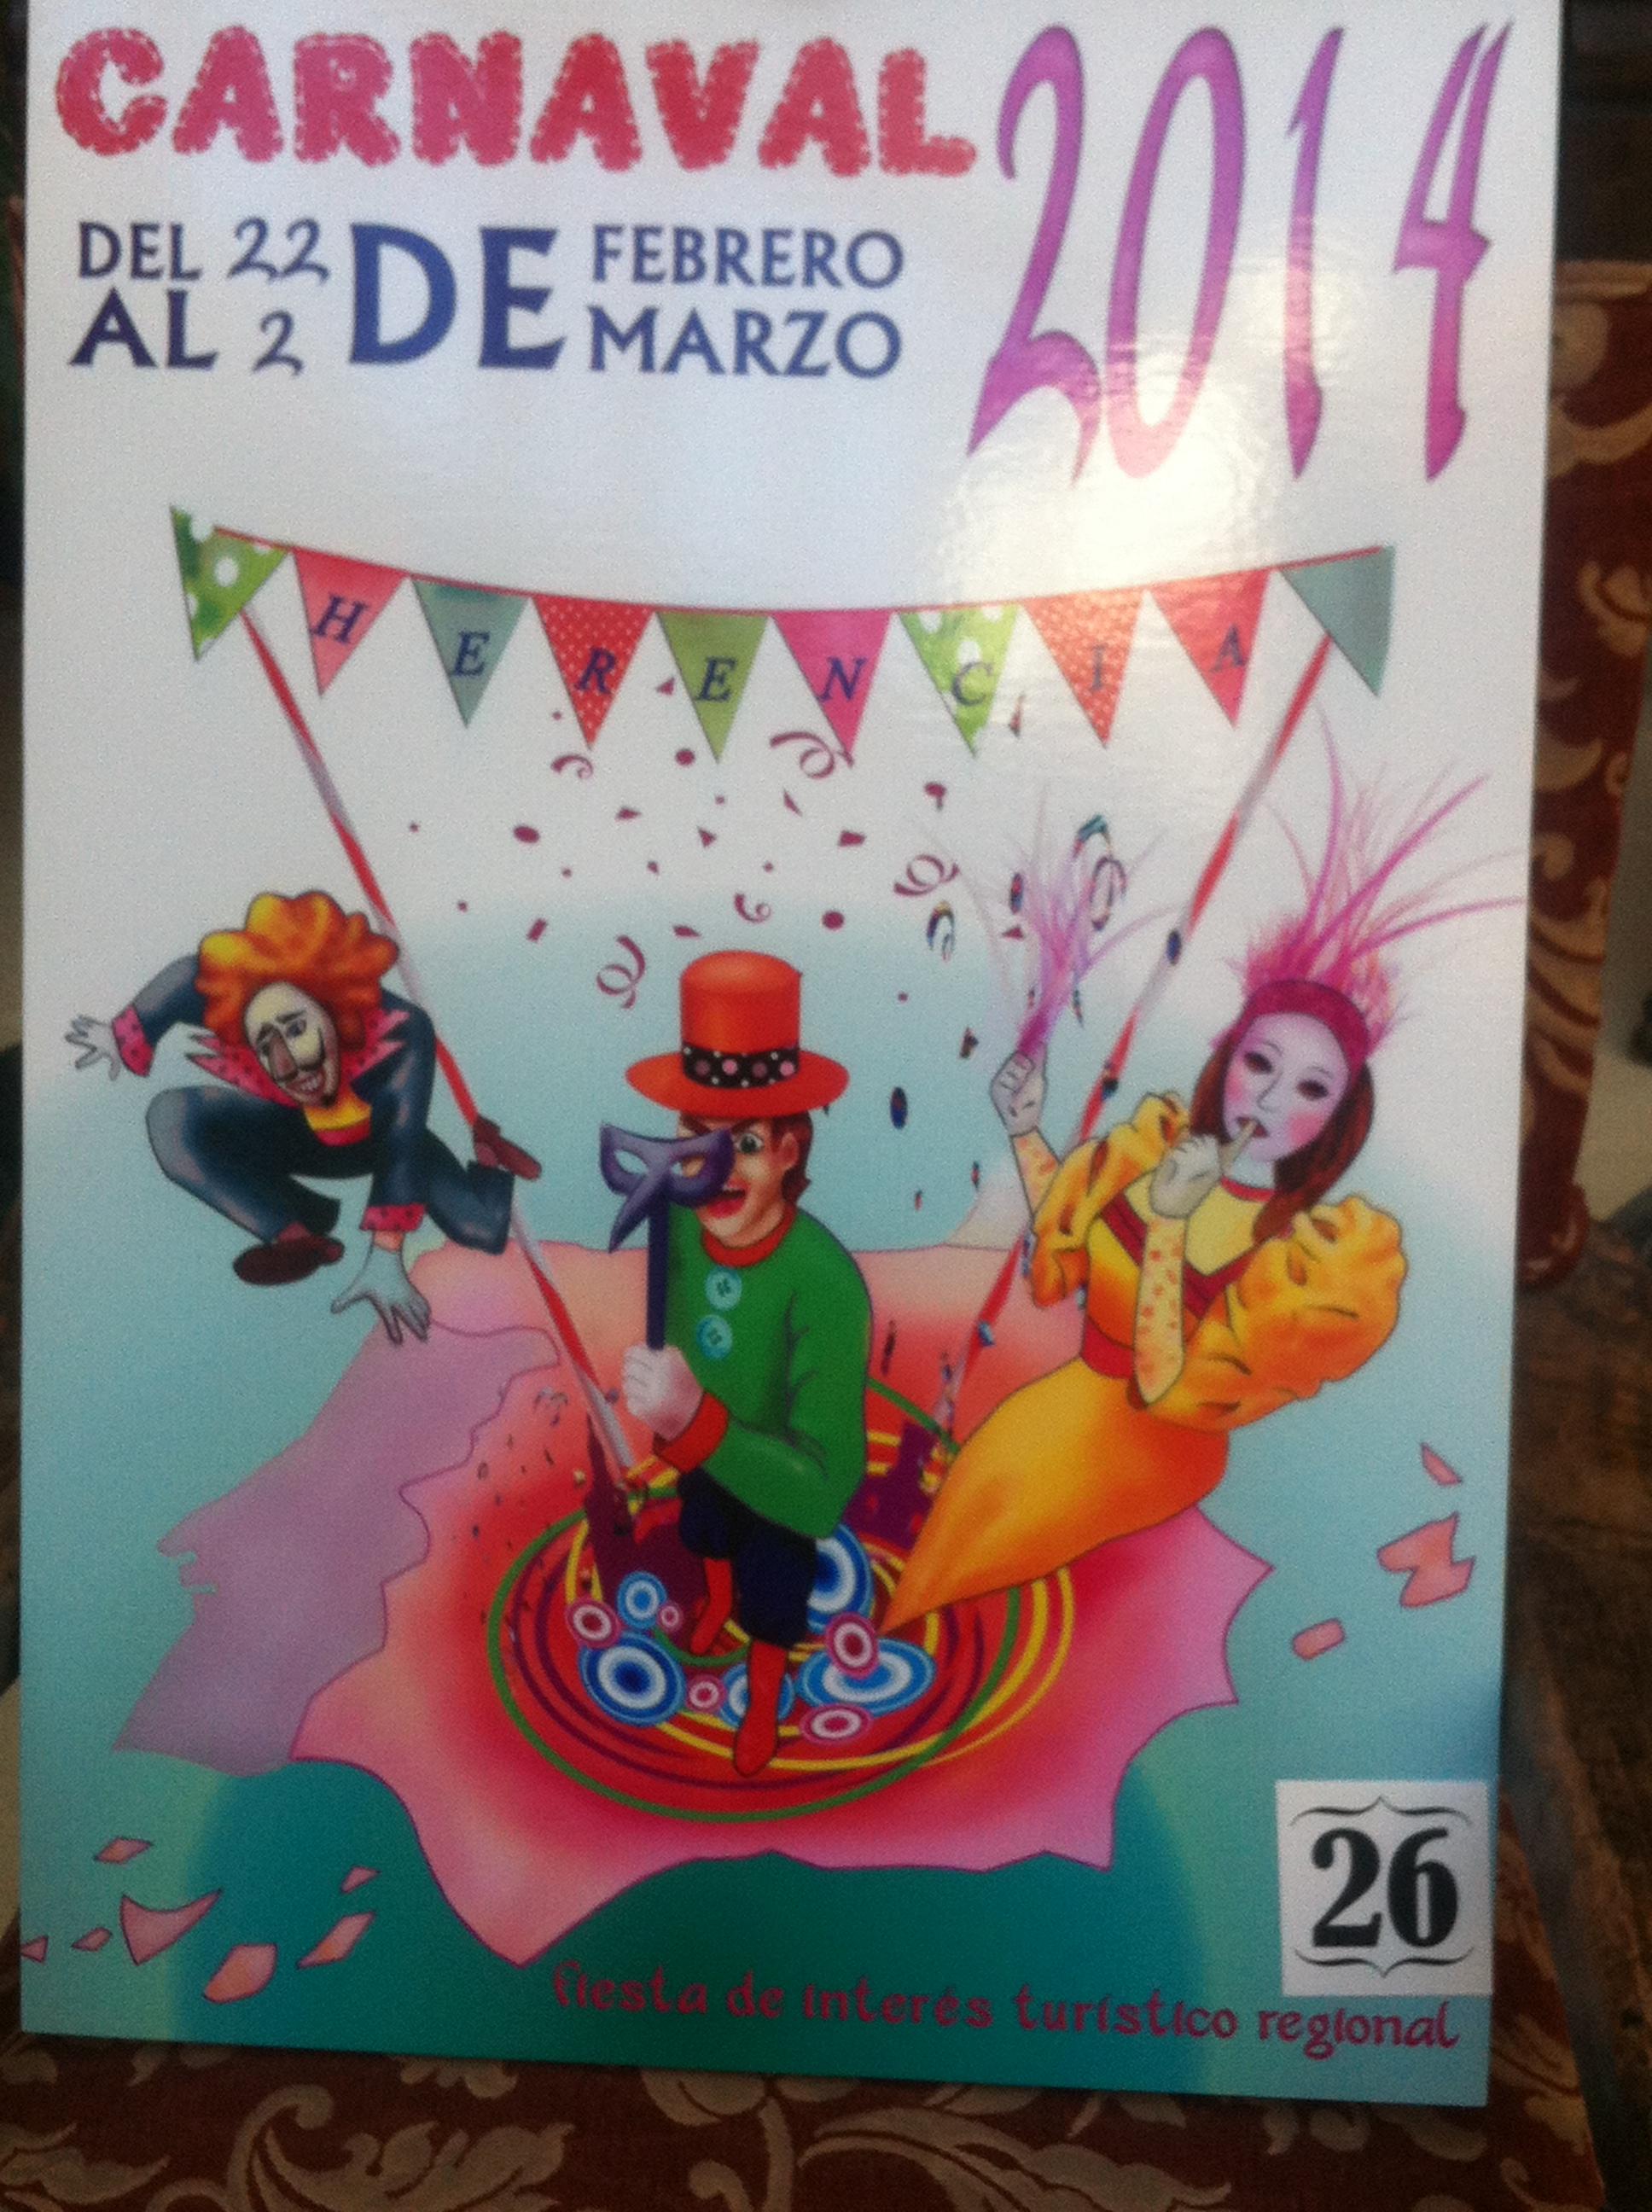 Concurso Carteles Carnaval 2014 (26)